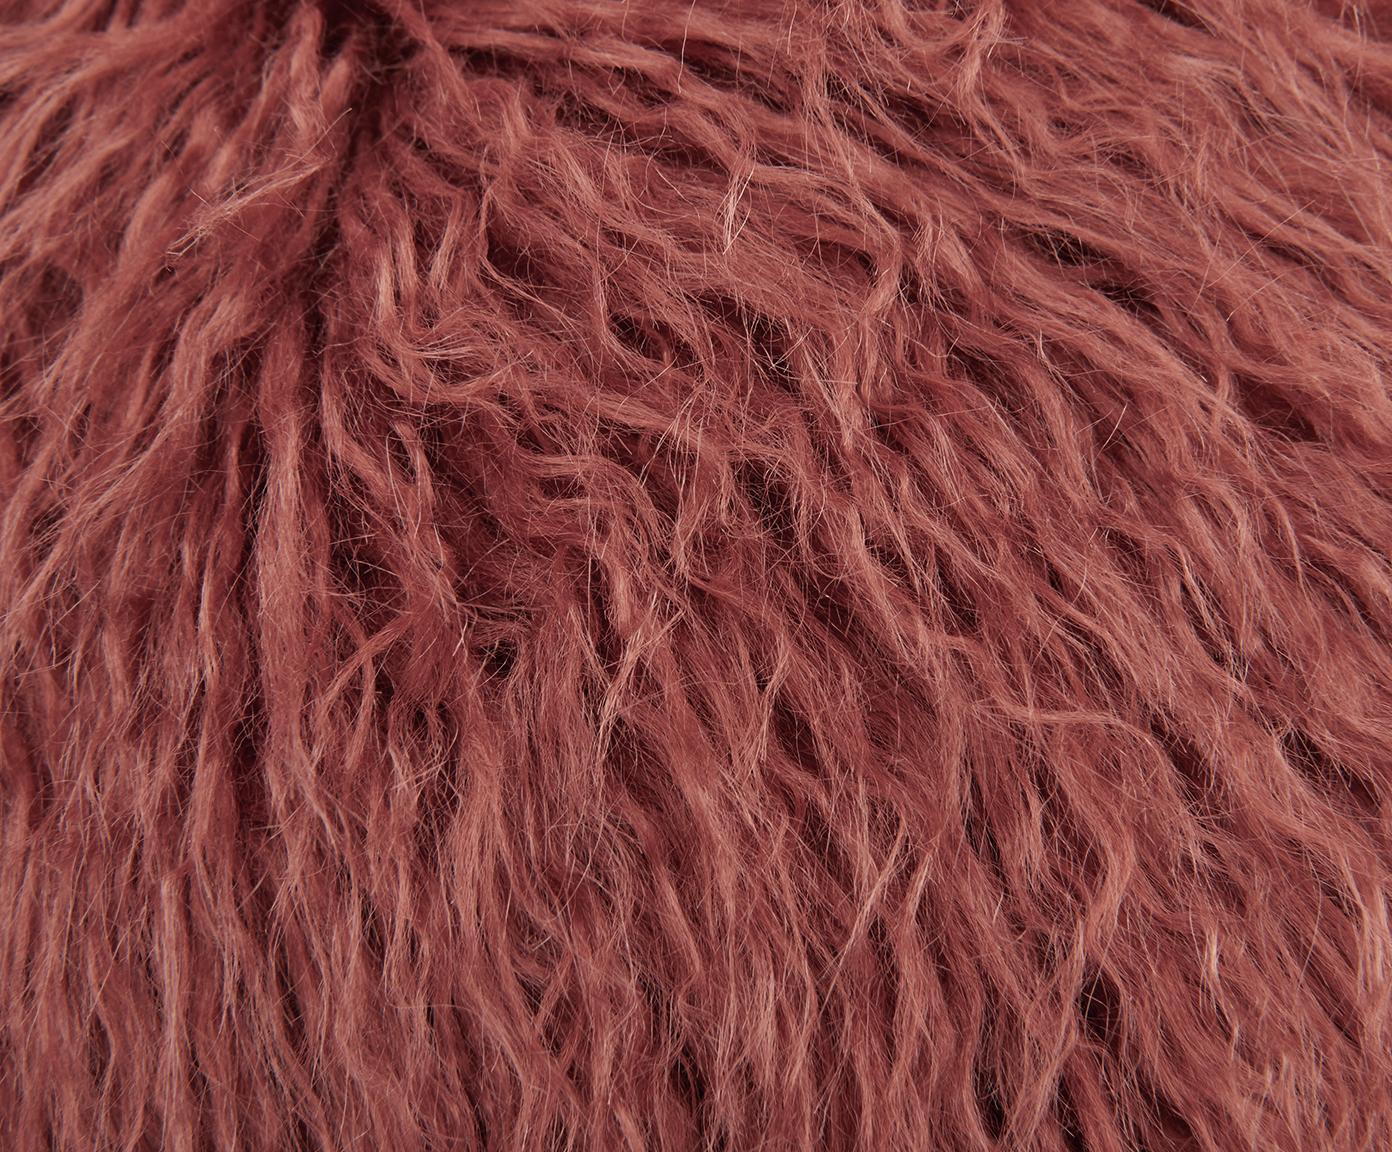 Flauschige Kunstfell-Kissenhülle Morten, gelockt, Vorderseite: 67% Akryl, 33% Polyester, Rückseite: 100% Polyester, Terrakotta, 40 x 40 cm